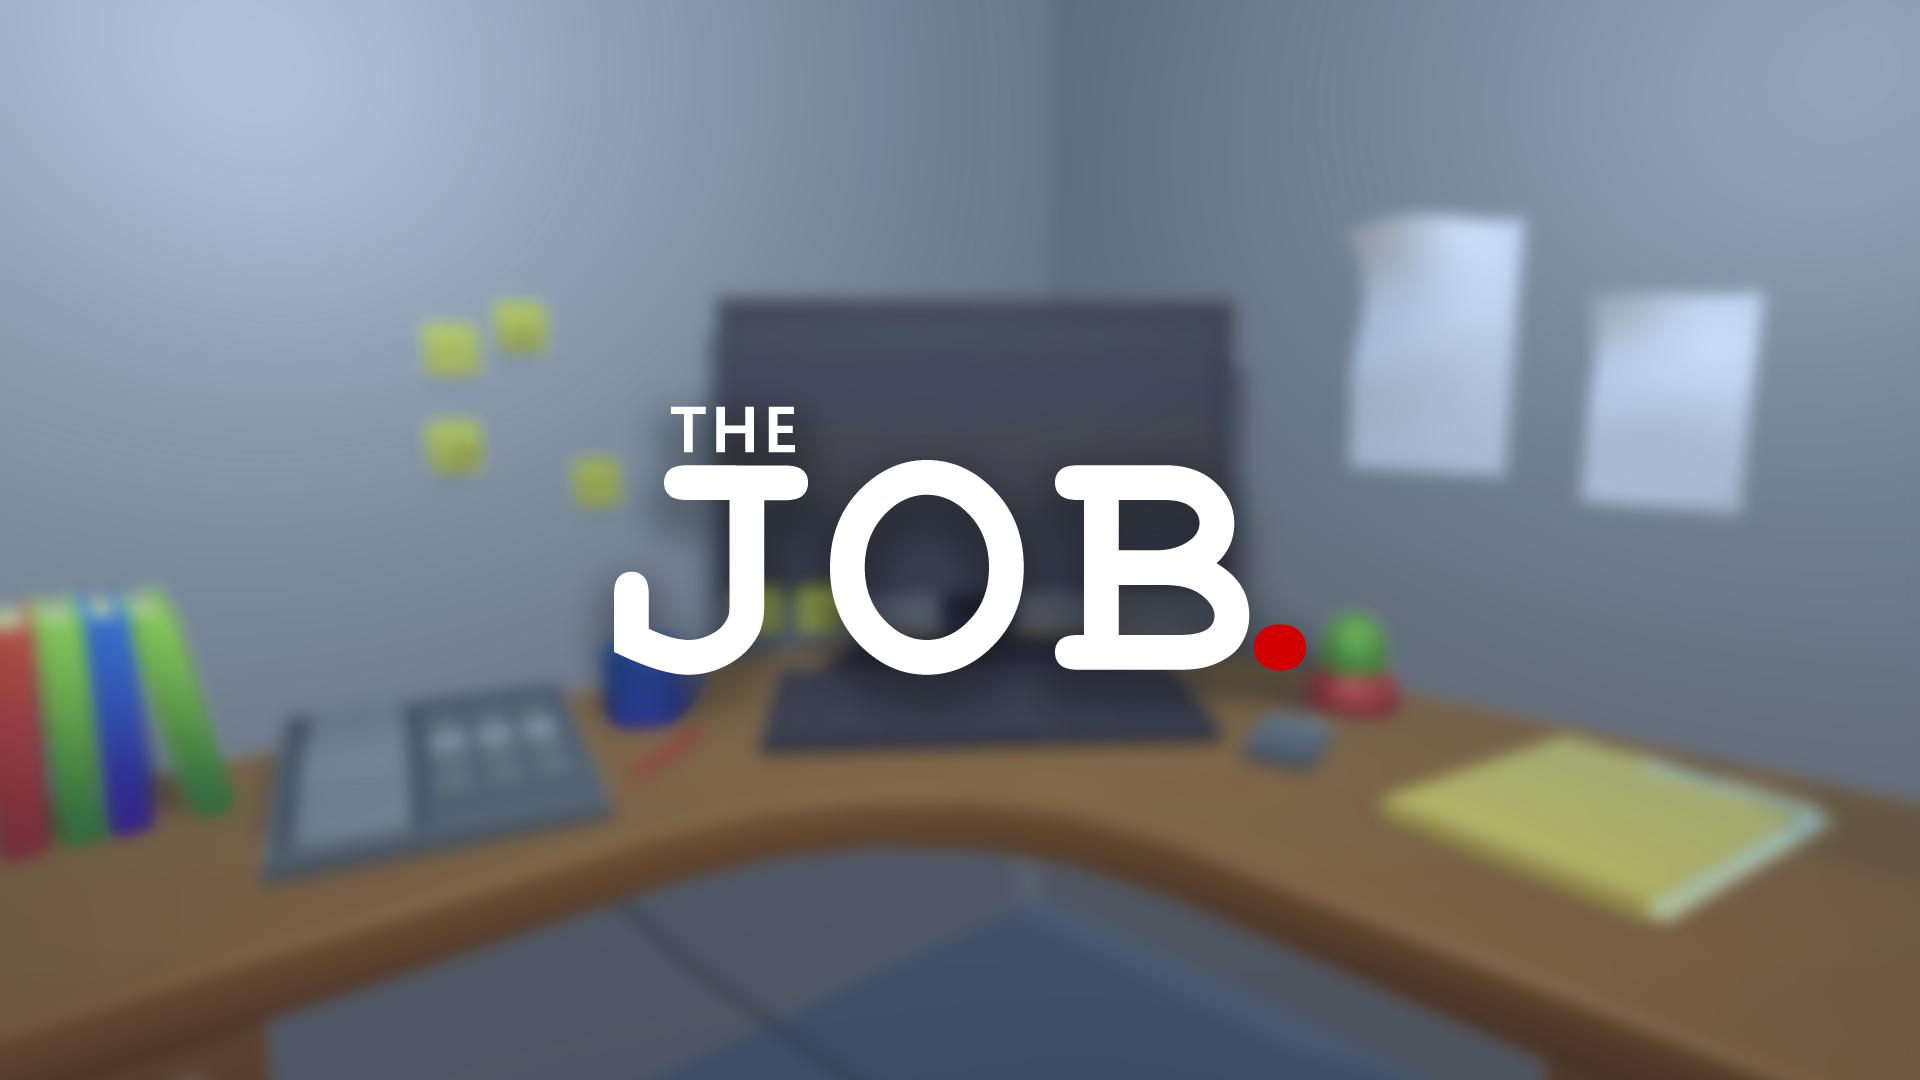 The Job.